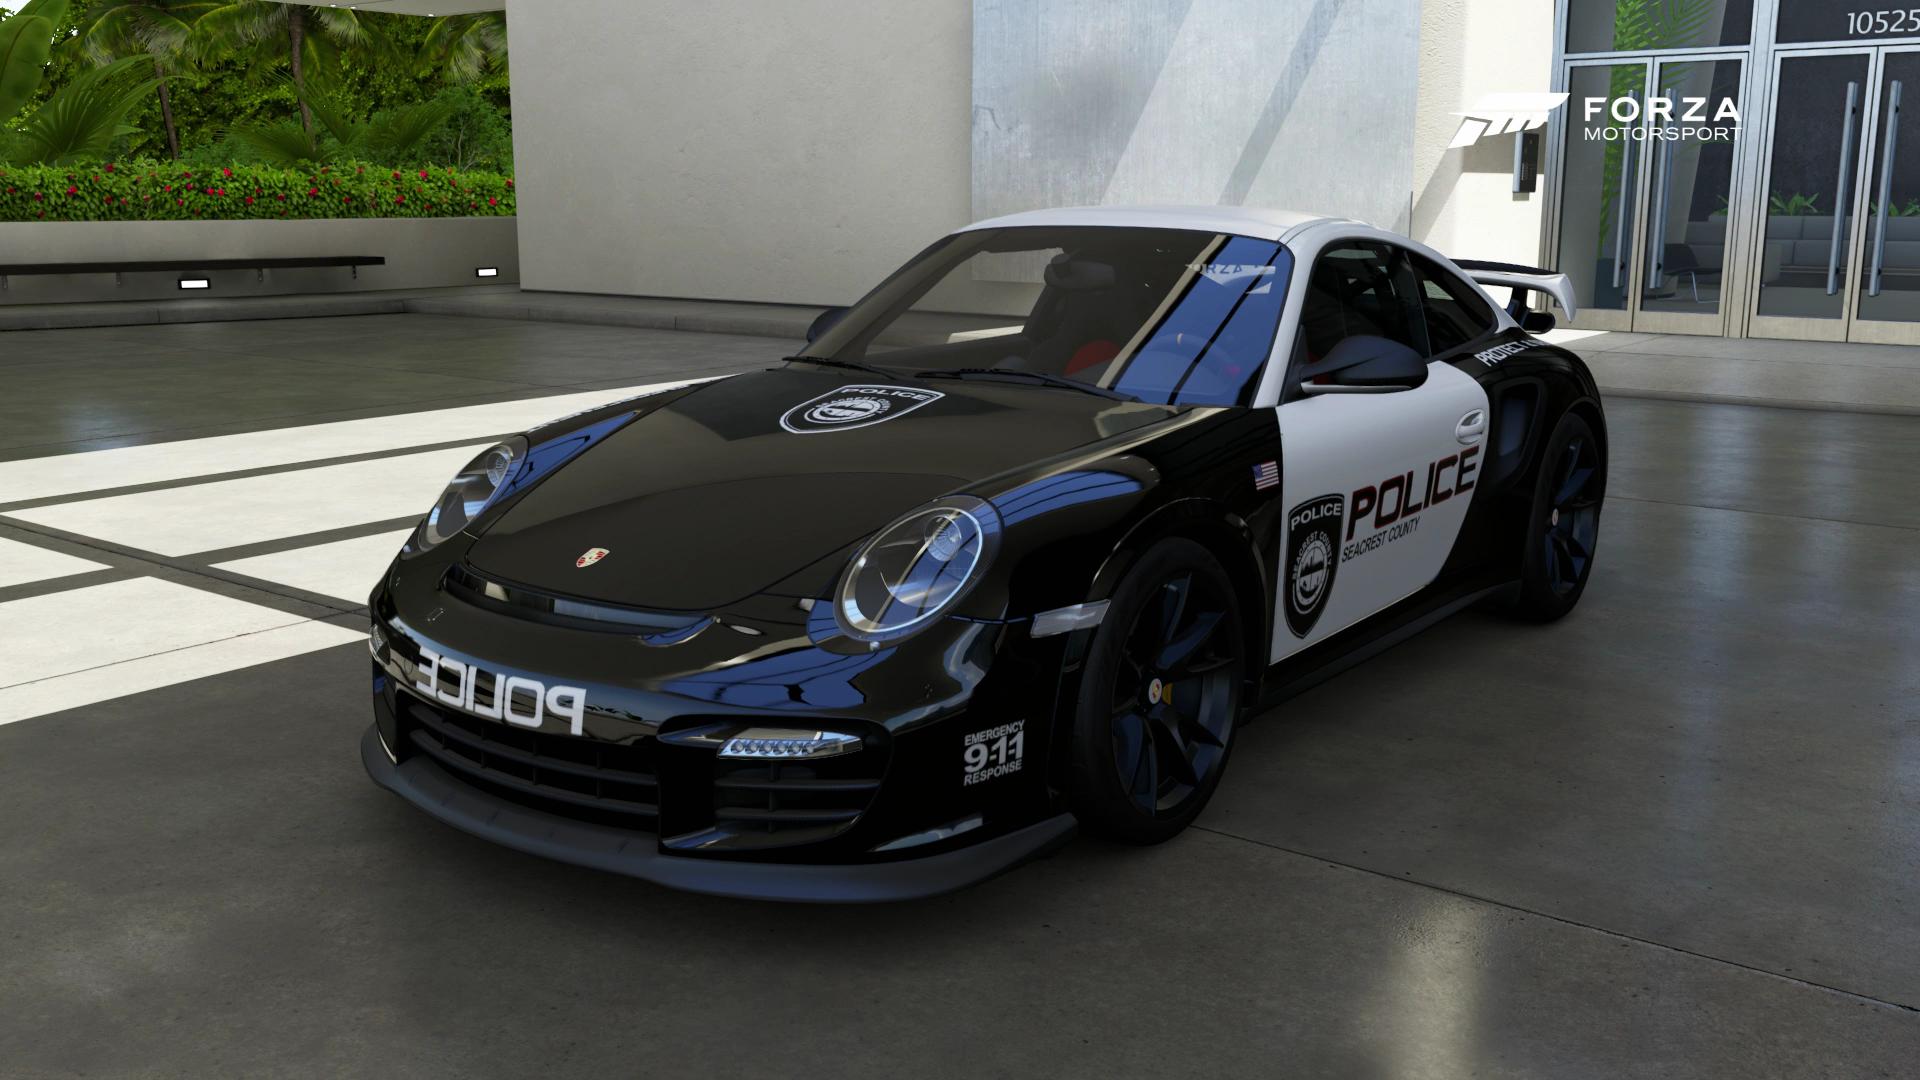 scpd___2012_porsche_911_gt2_rs___front_by_xboxgamer969-d9u4ed2 Astounding Porsche 911 Gt2 Rs 2012 Cars Trend